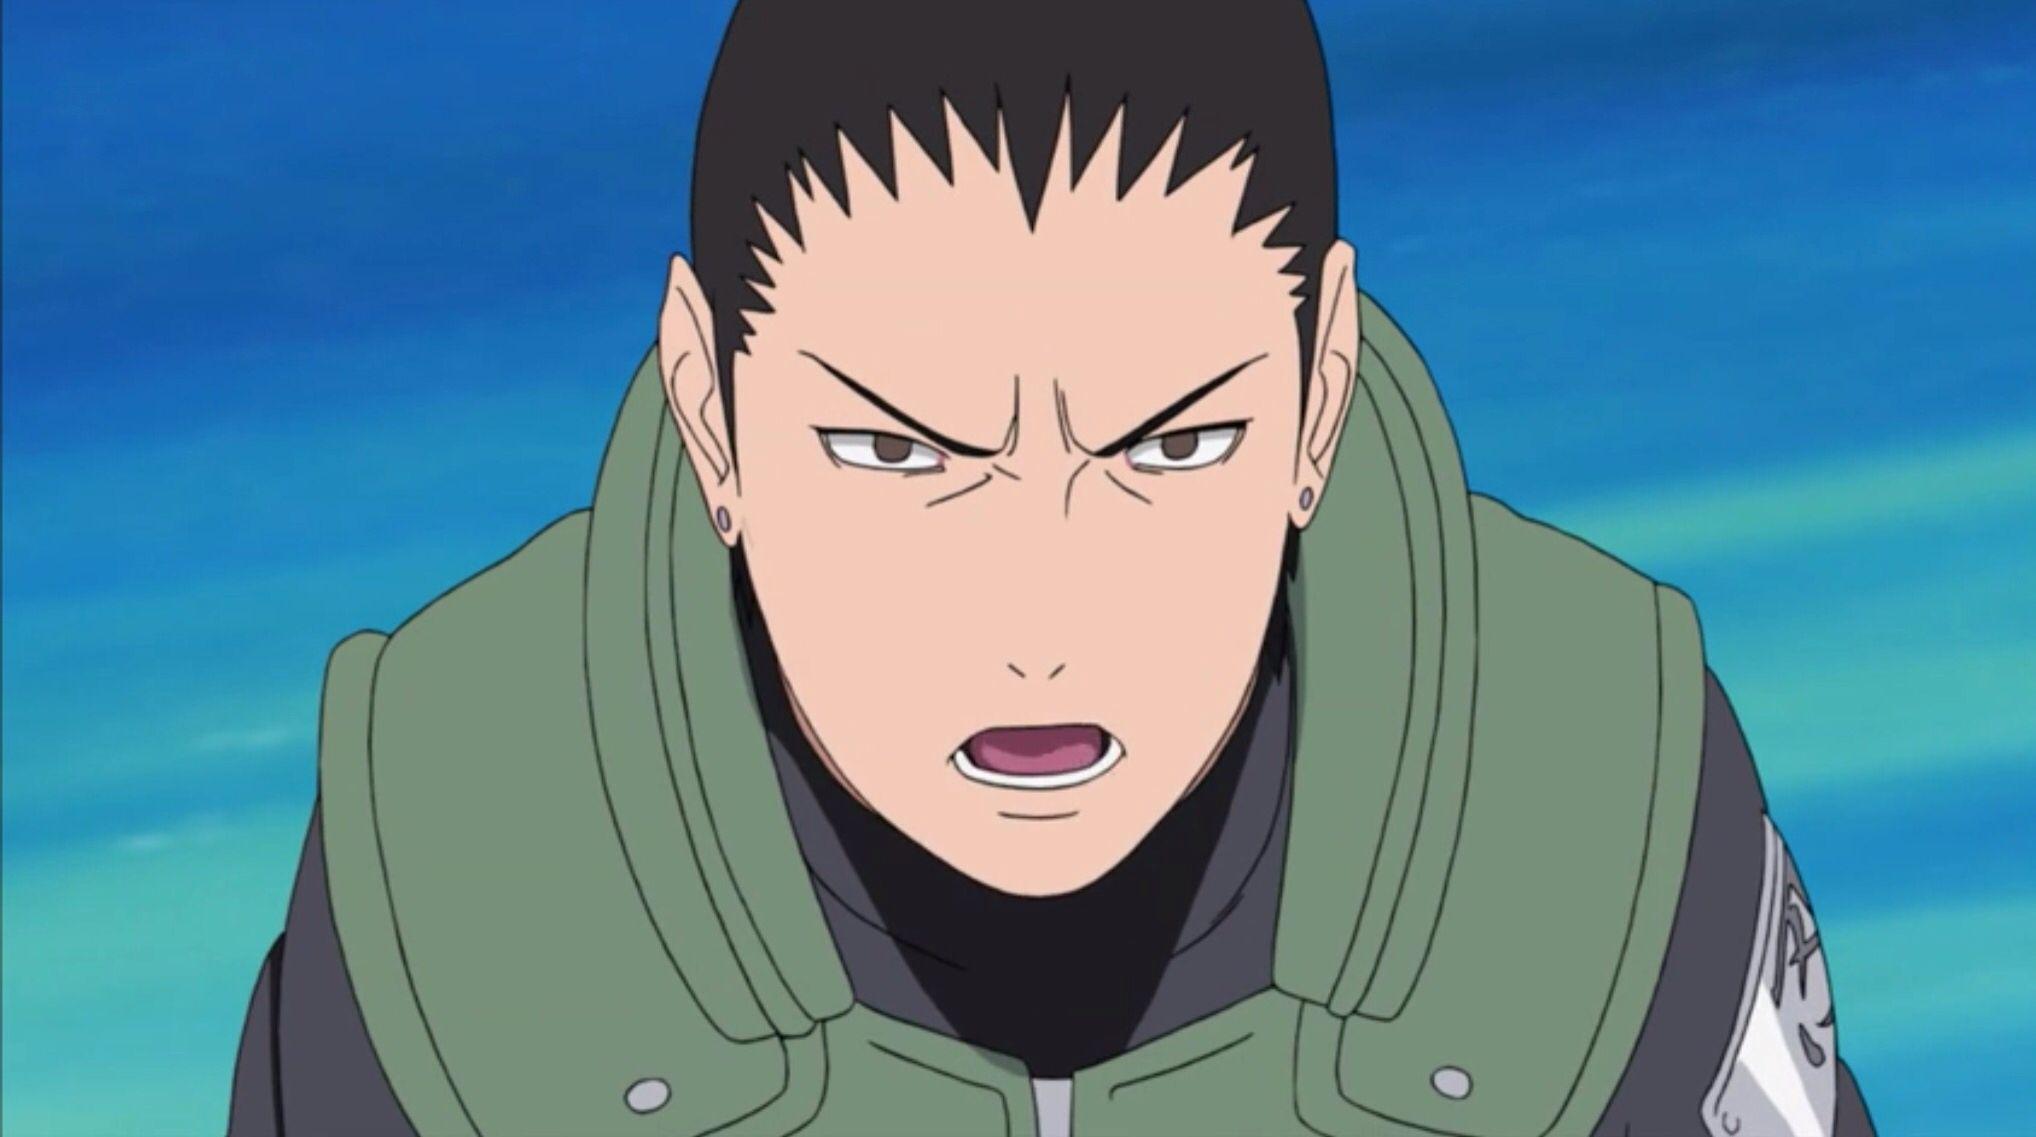 Shikamaru Nara 4th Great Ninja War Arc | Anime naruto ...